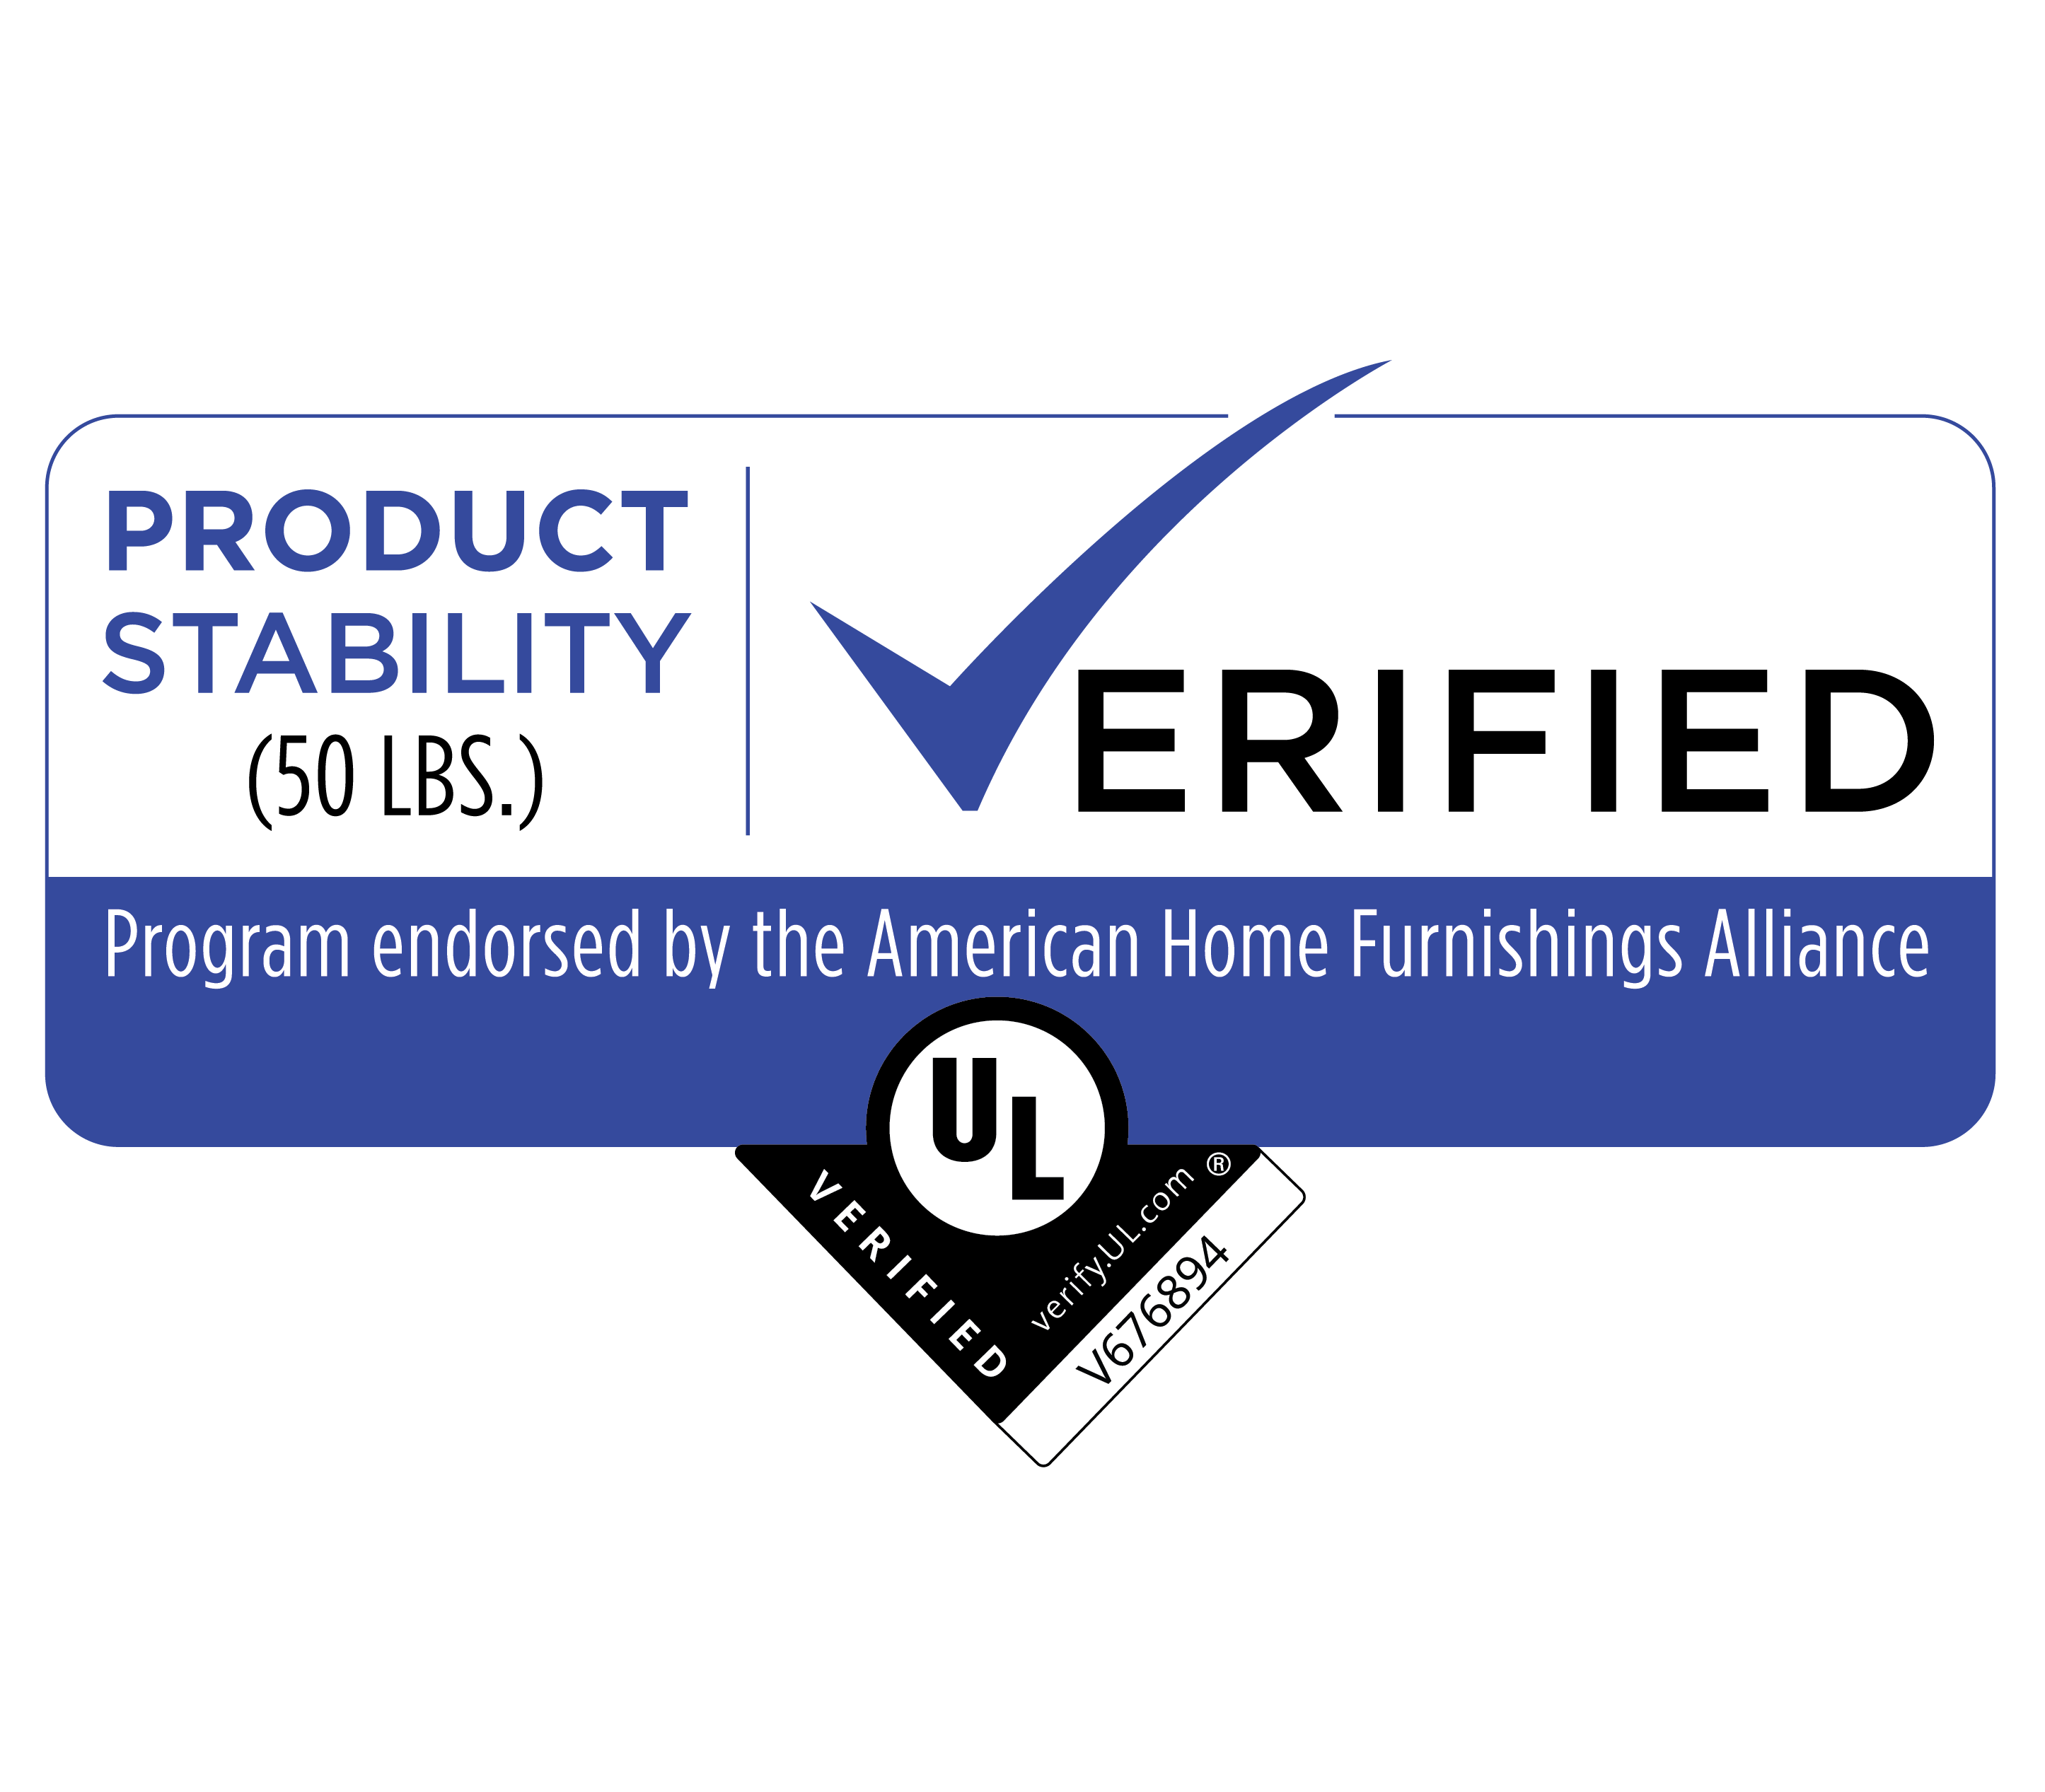 Verification Mark